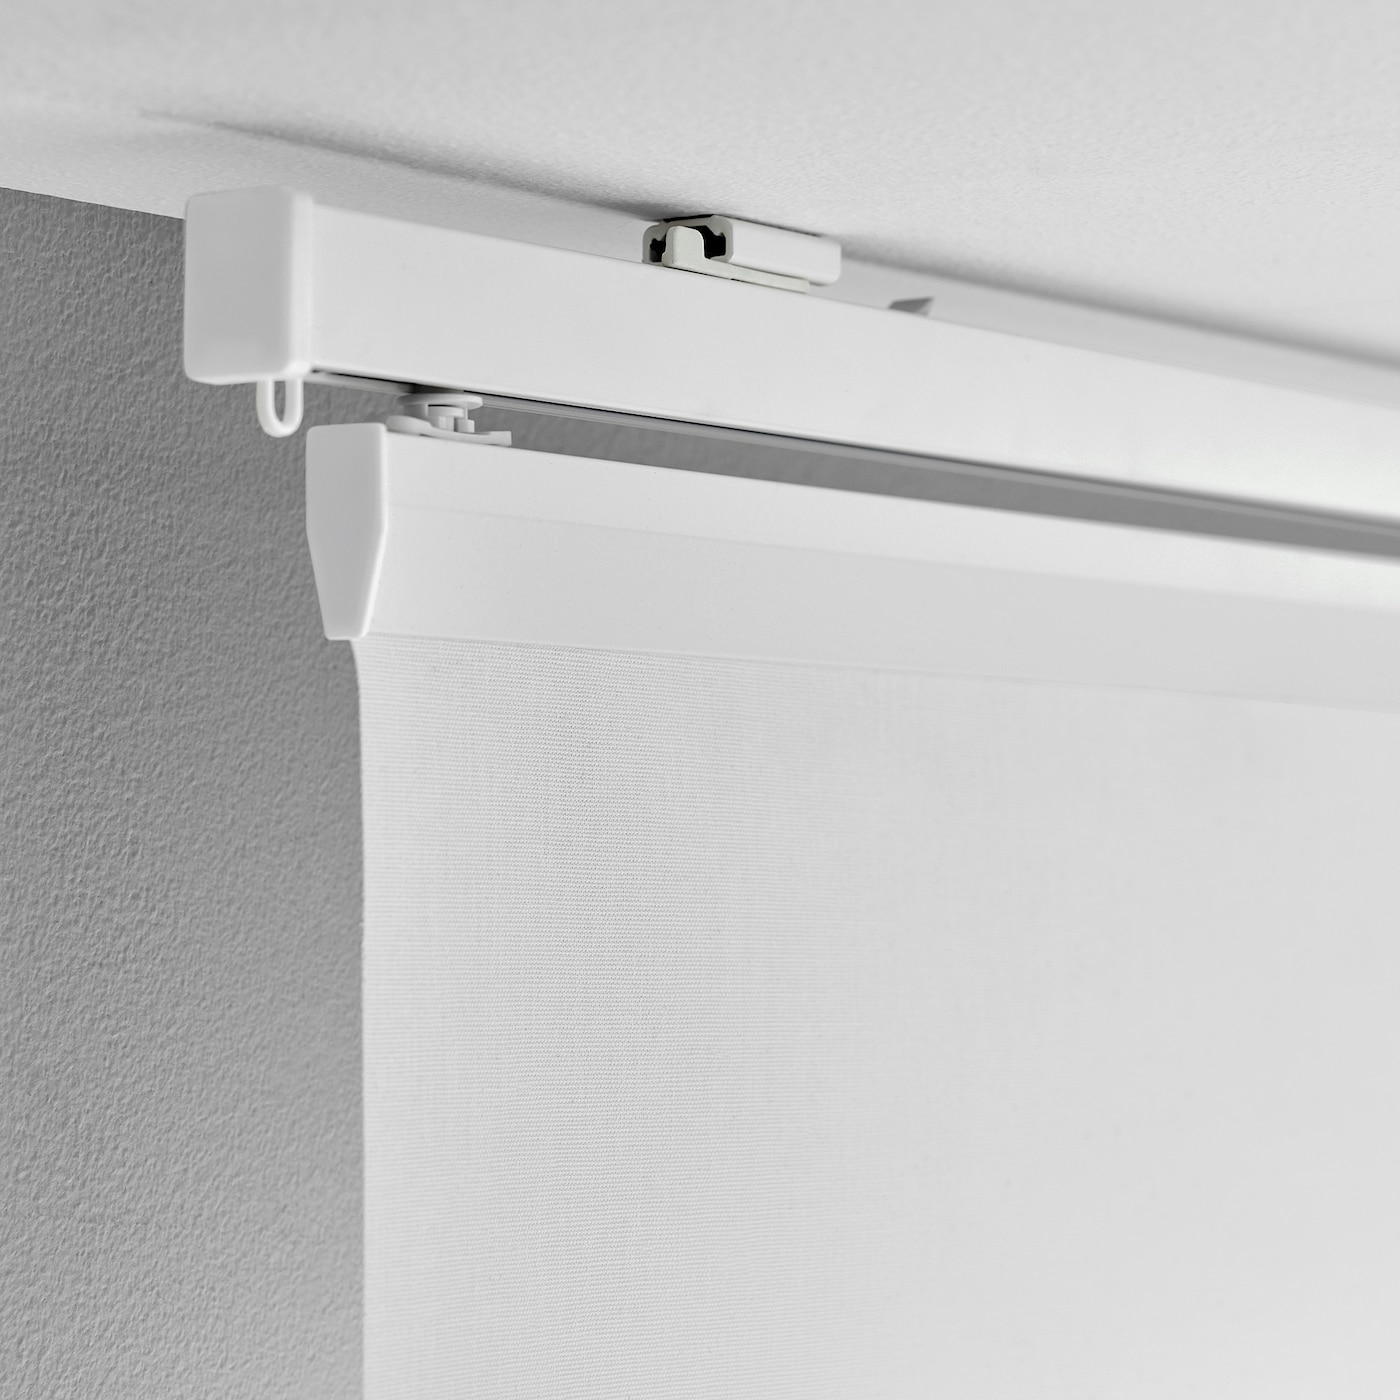 IKEA Vidga Ceiling Bracket White Set of 2 902.990.91